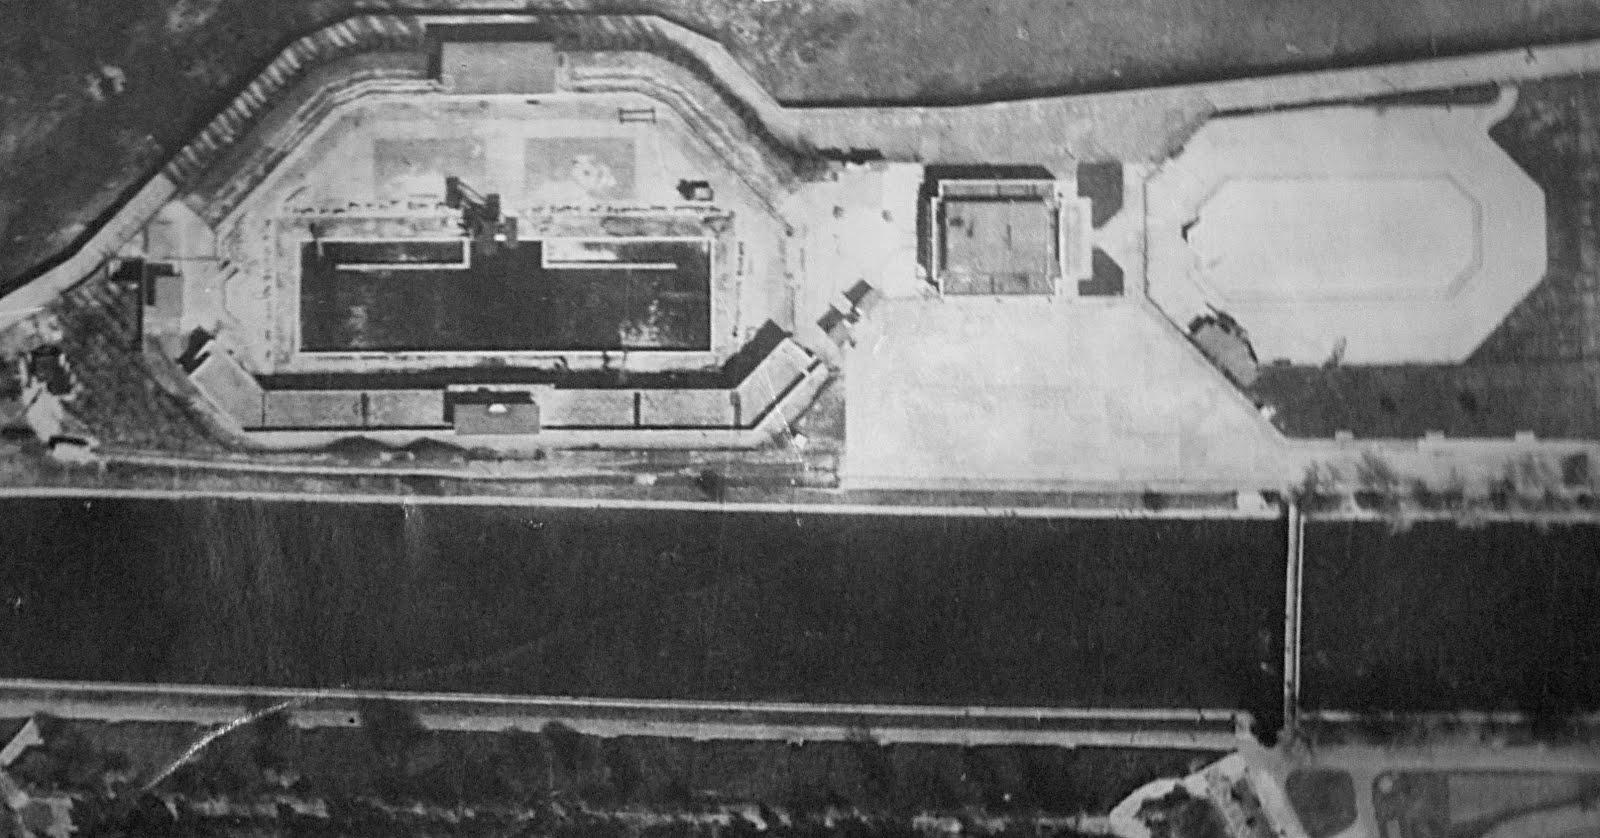 Hilsea Lido 1947